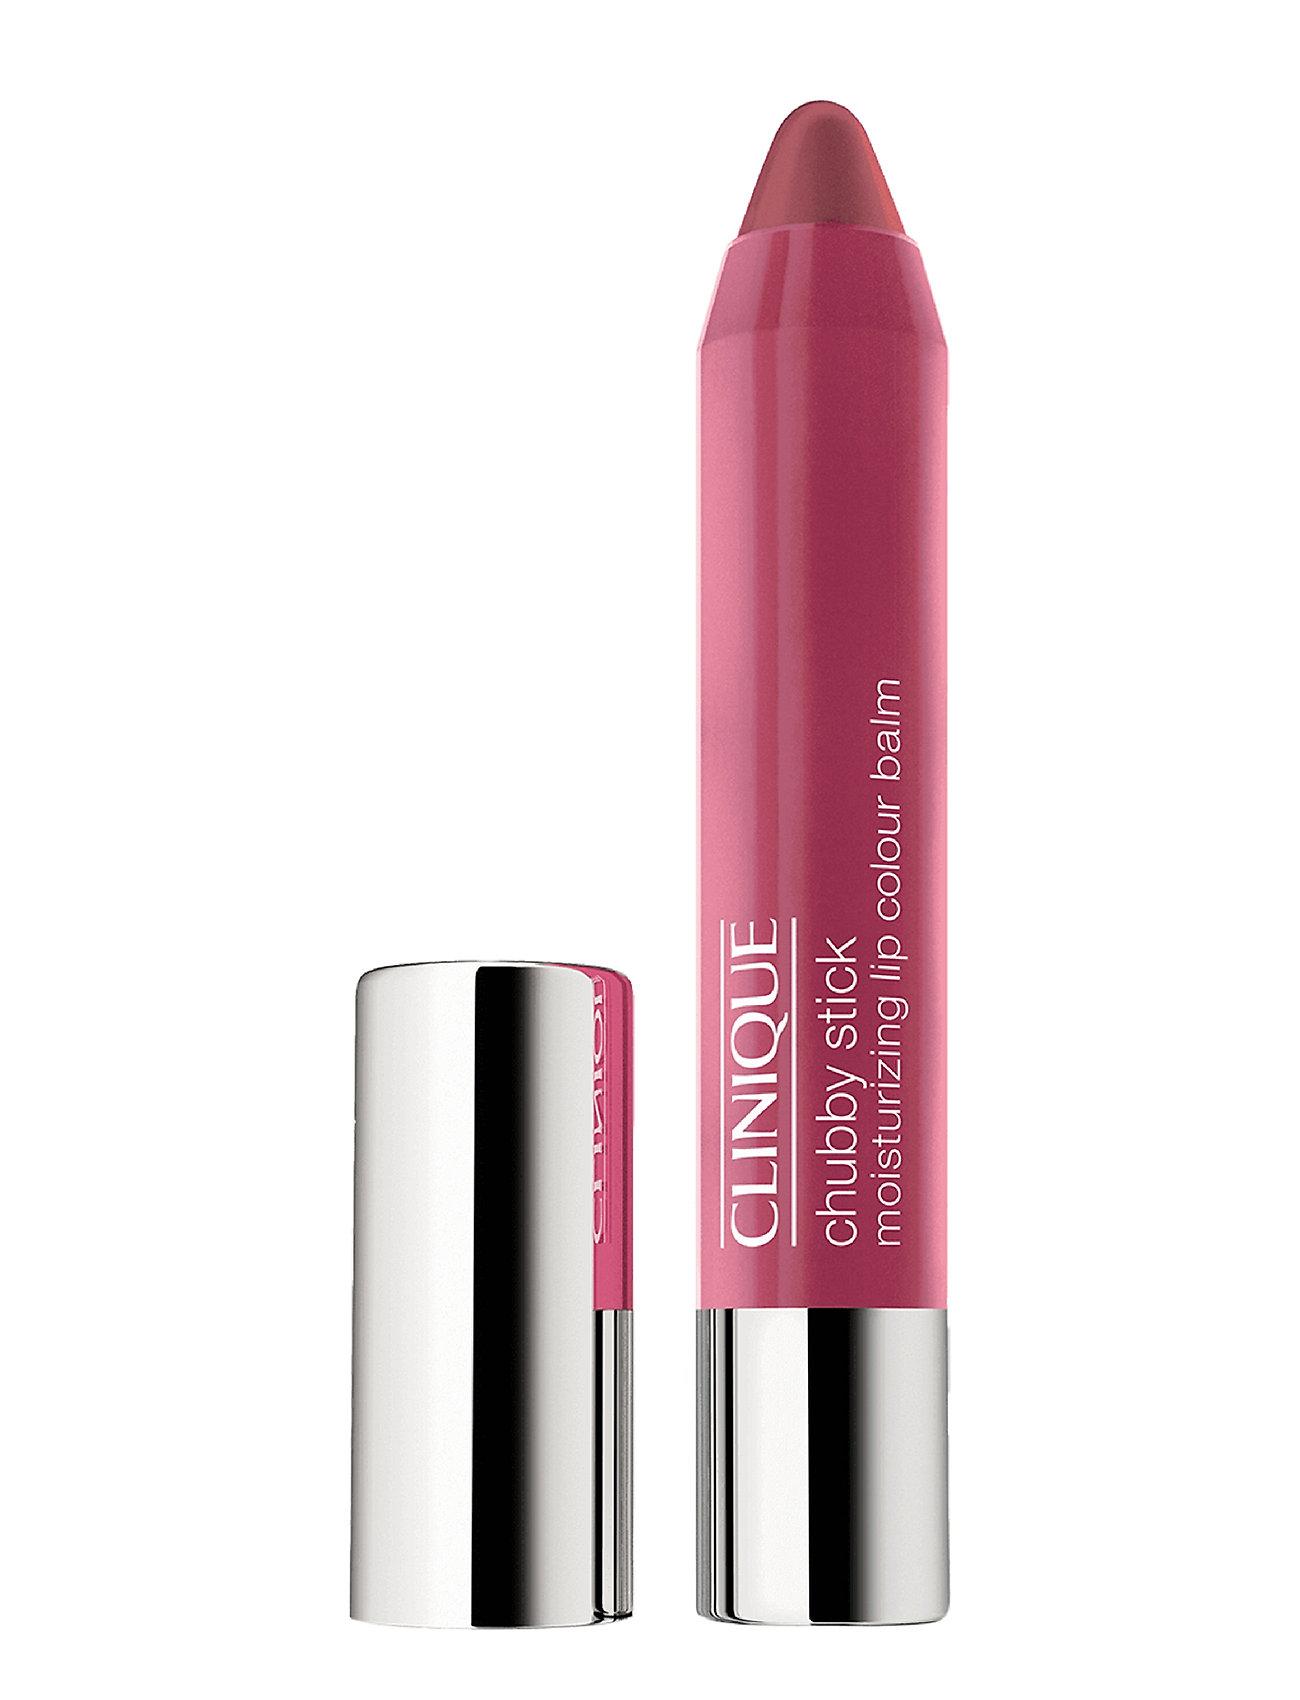 Chubby Stick Moisturizing Lip Colour Balm Clinique  til Damer i